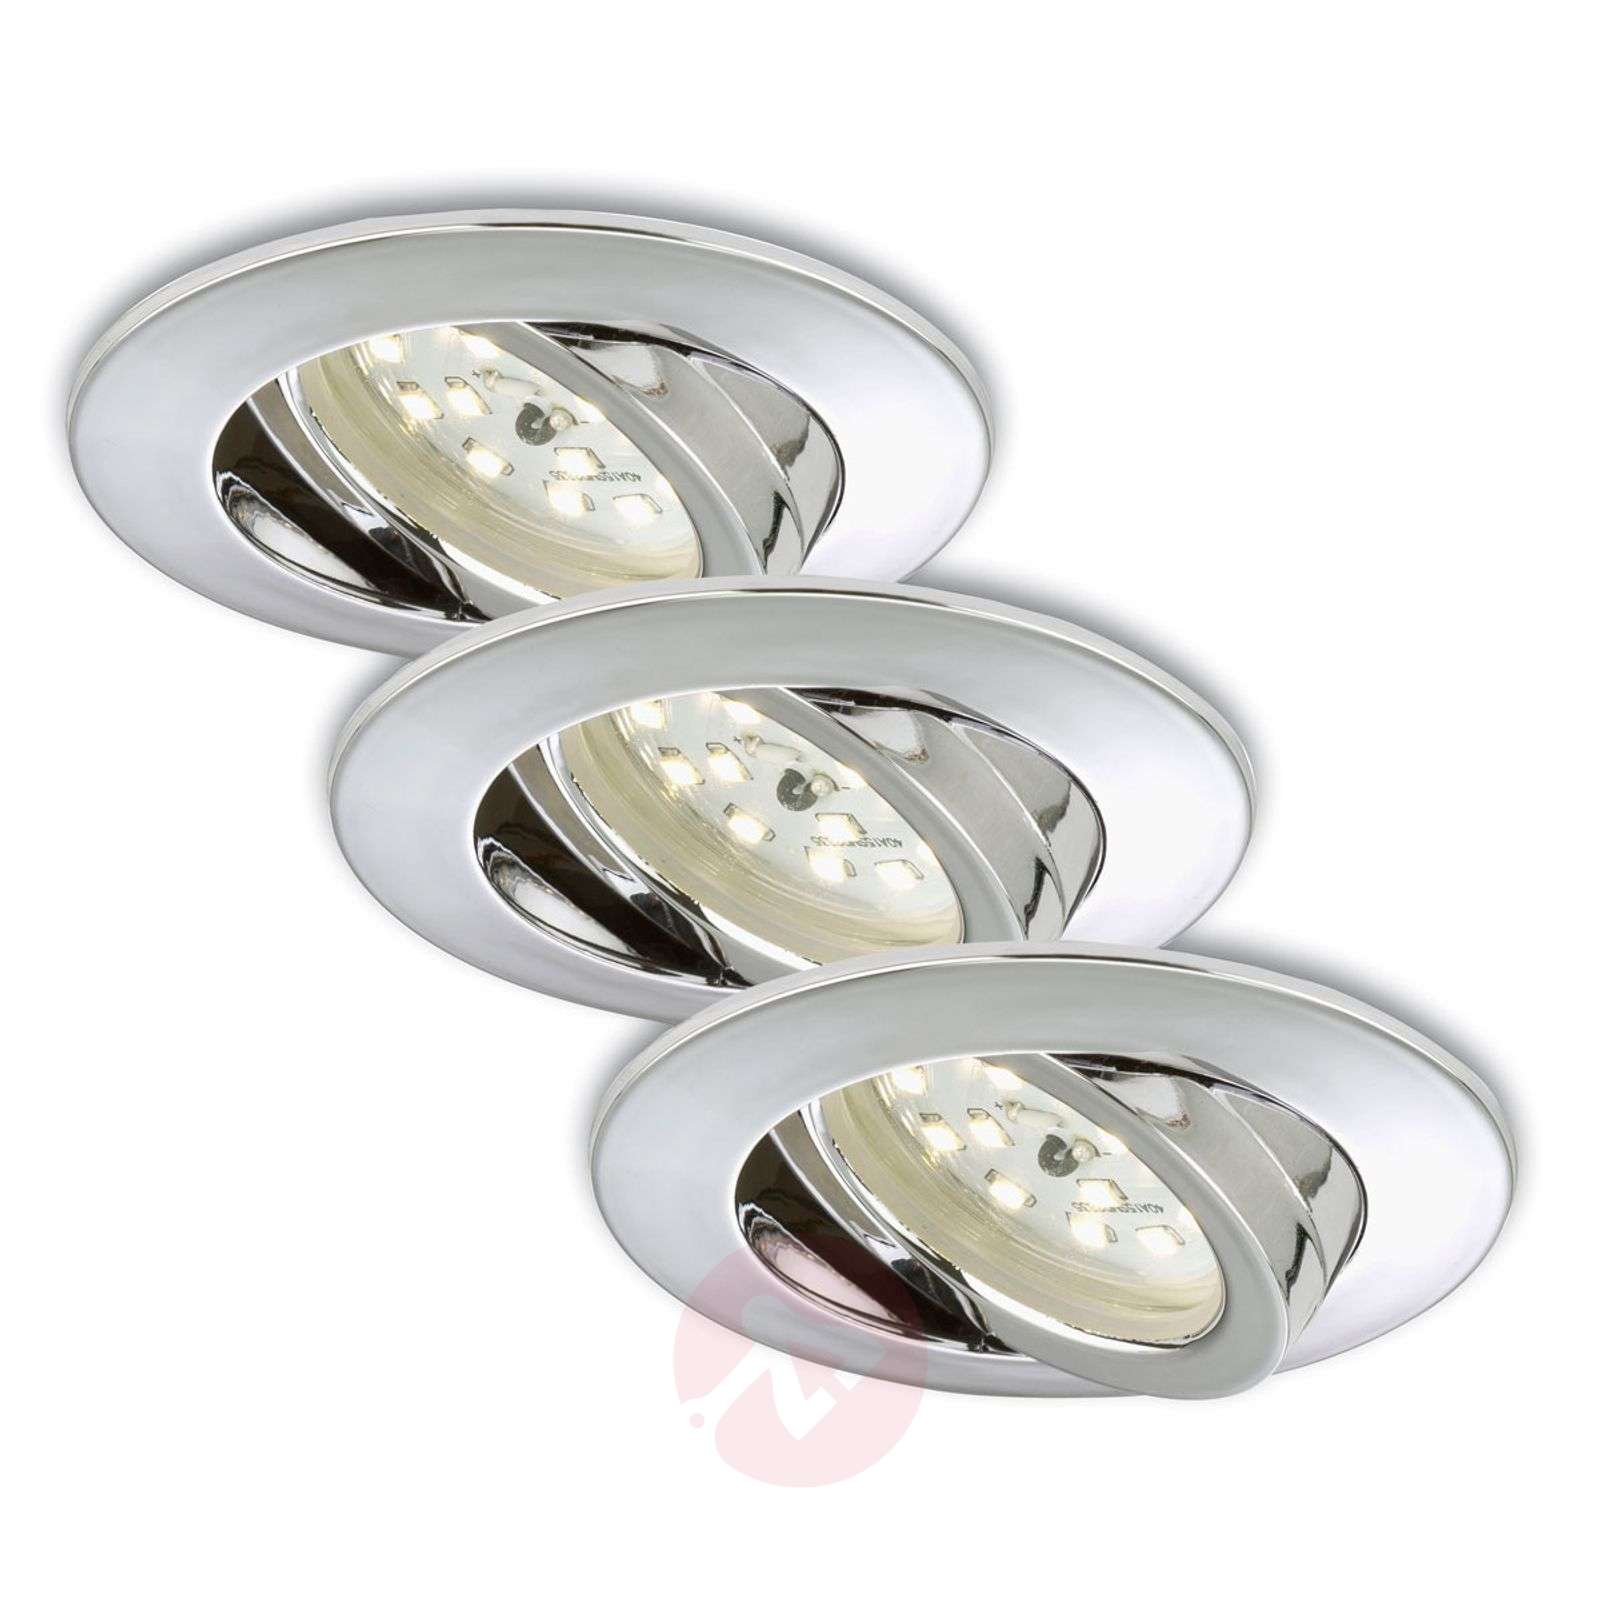 3 kpl:n setti – Erik-LED-uppokohdevalaisin kromi-1510285-01